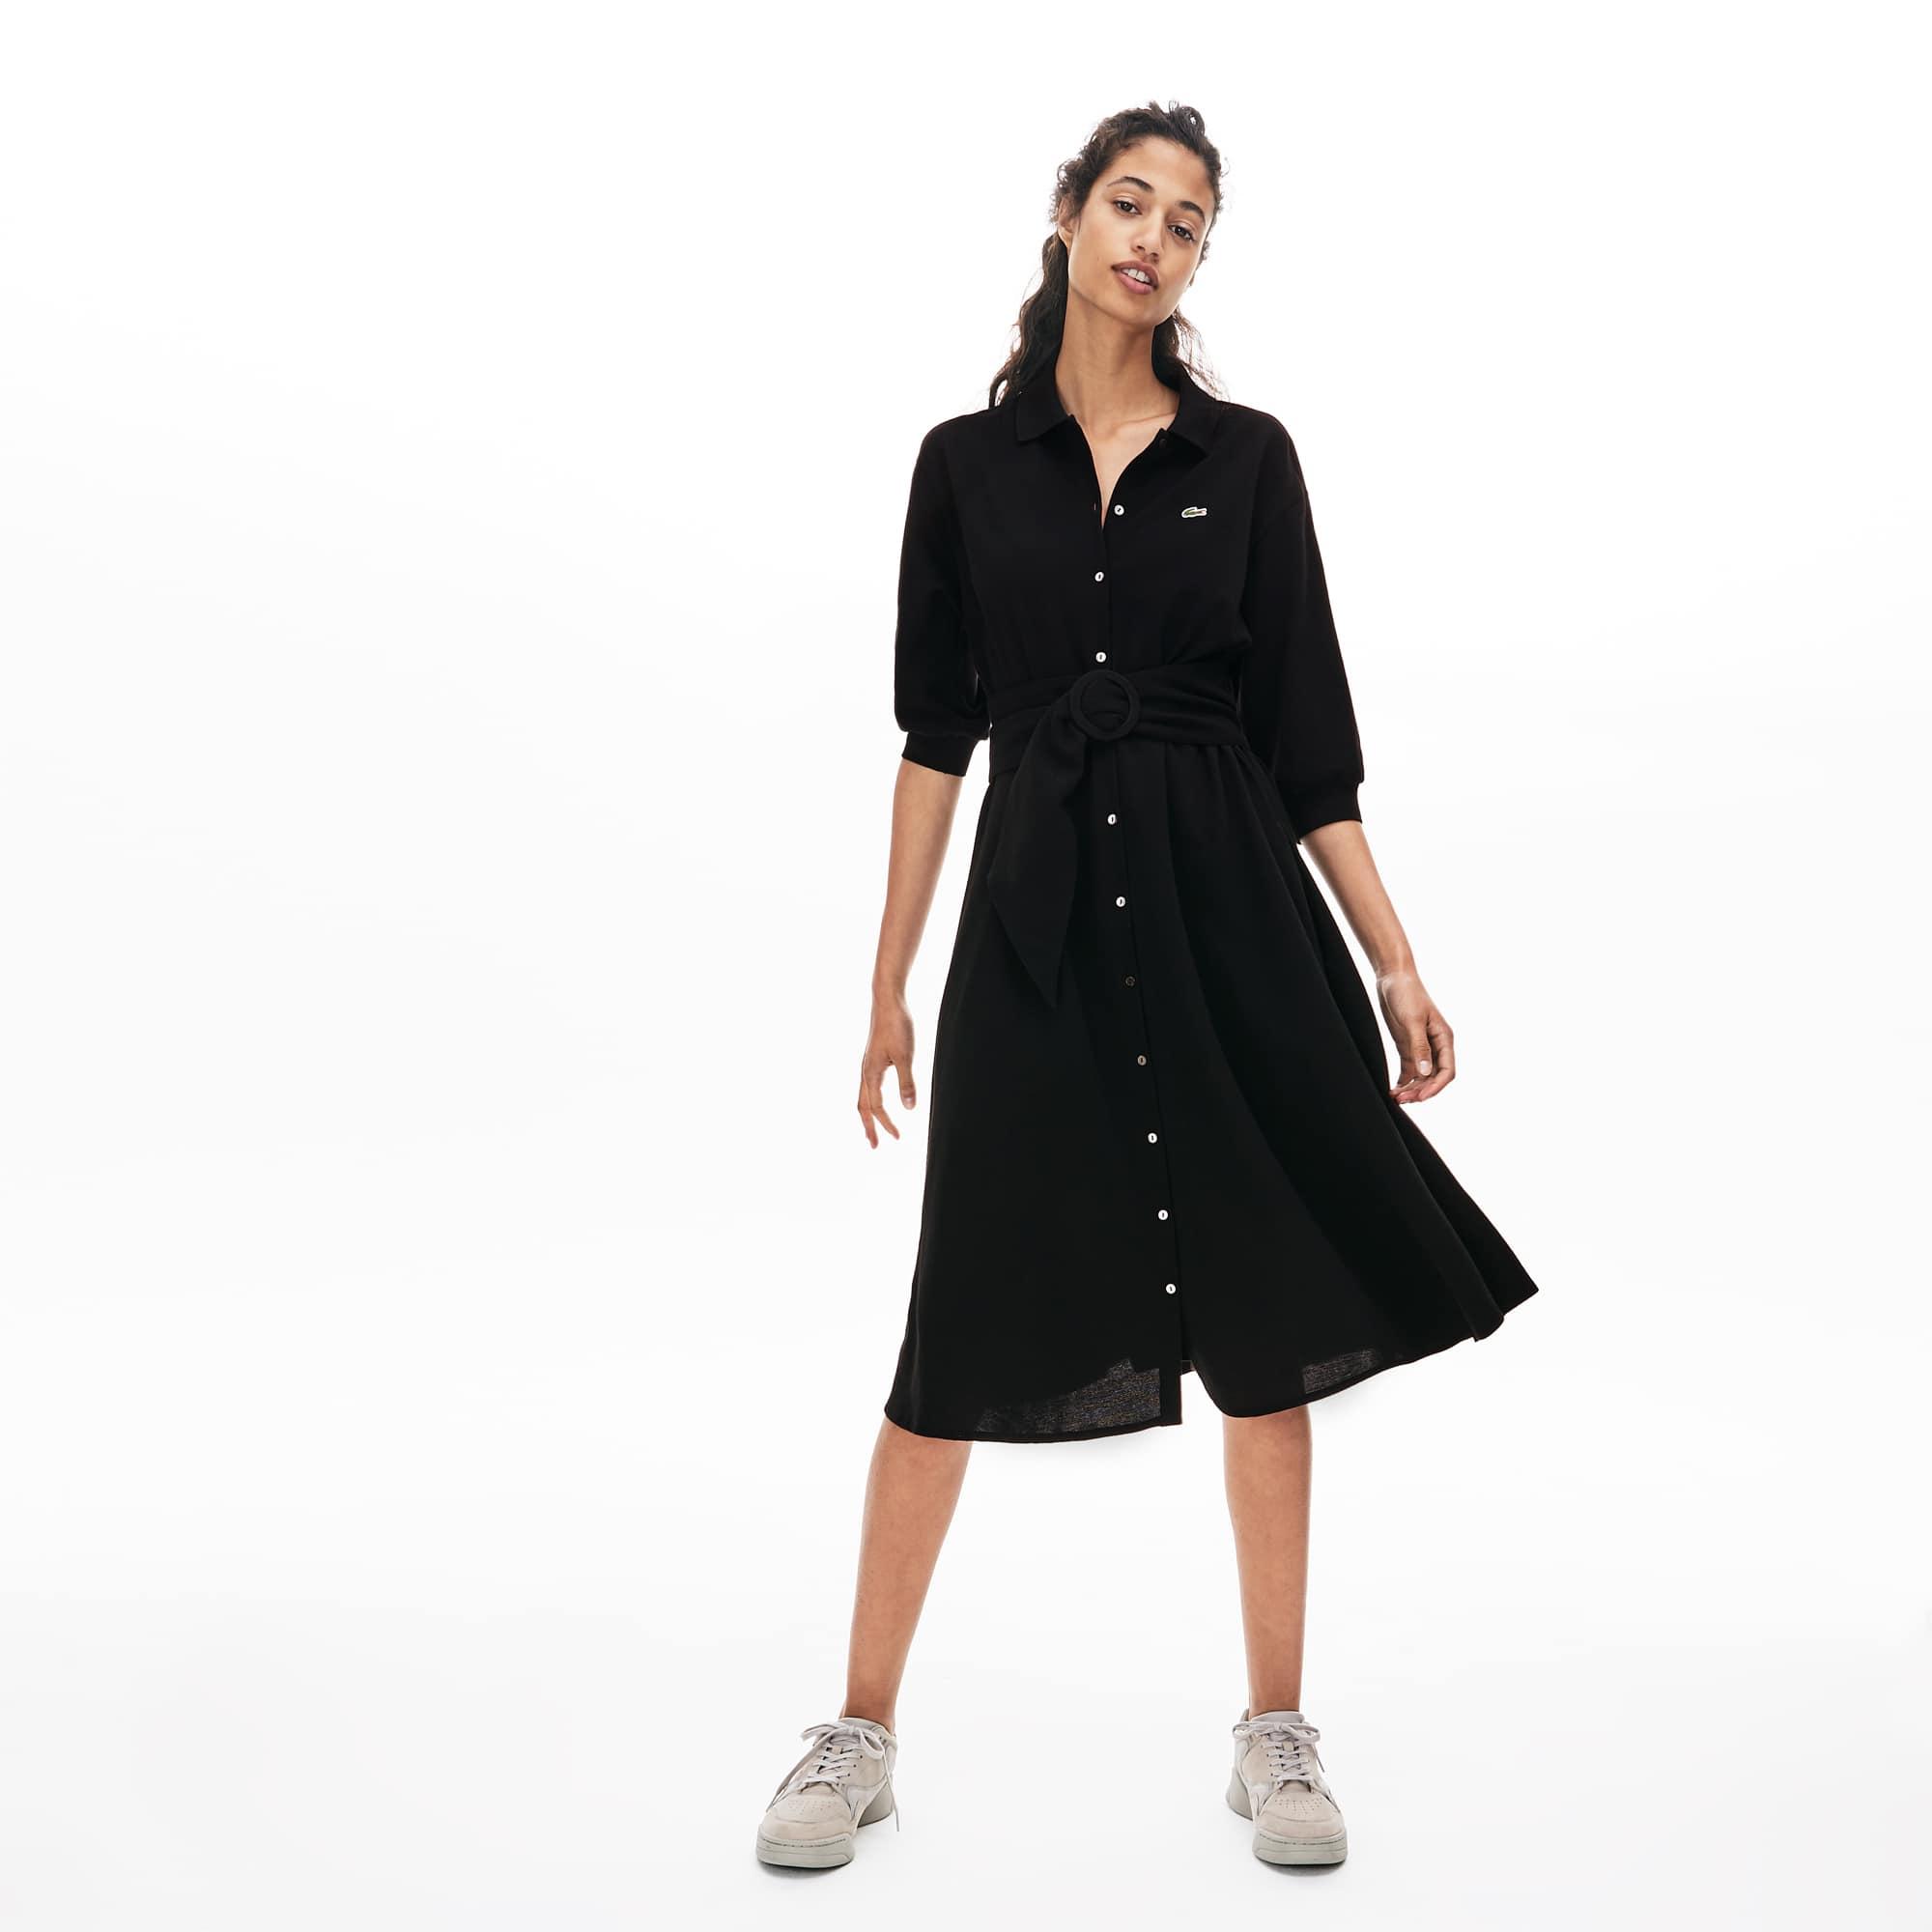 b62e33bb0a578a Robes & Jupes | Vêtements Femme | LACOSTE